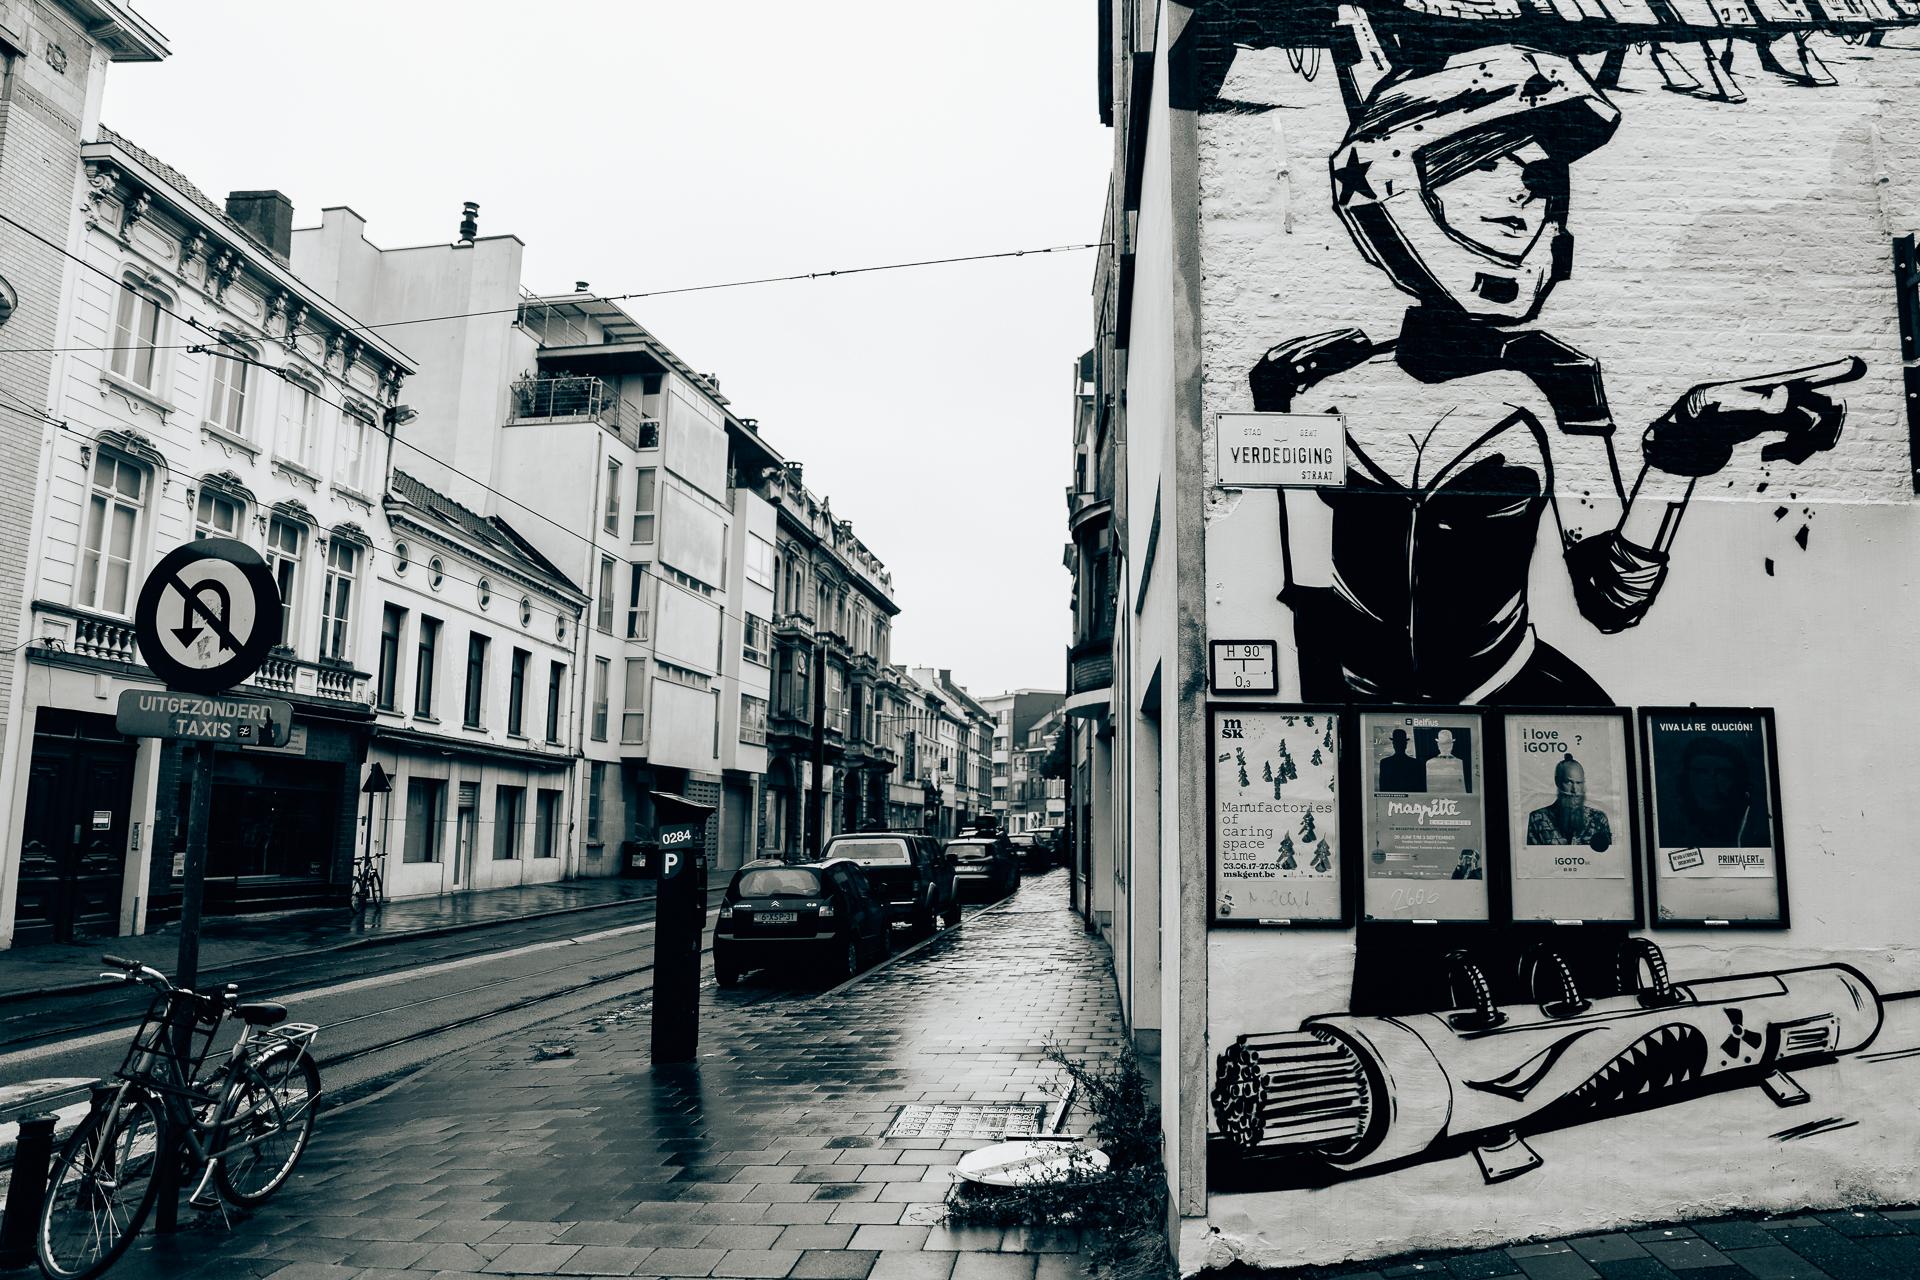 Urban Art - Tag vs. Nacht: Kann Kunst illegal sein?